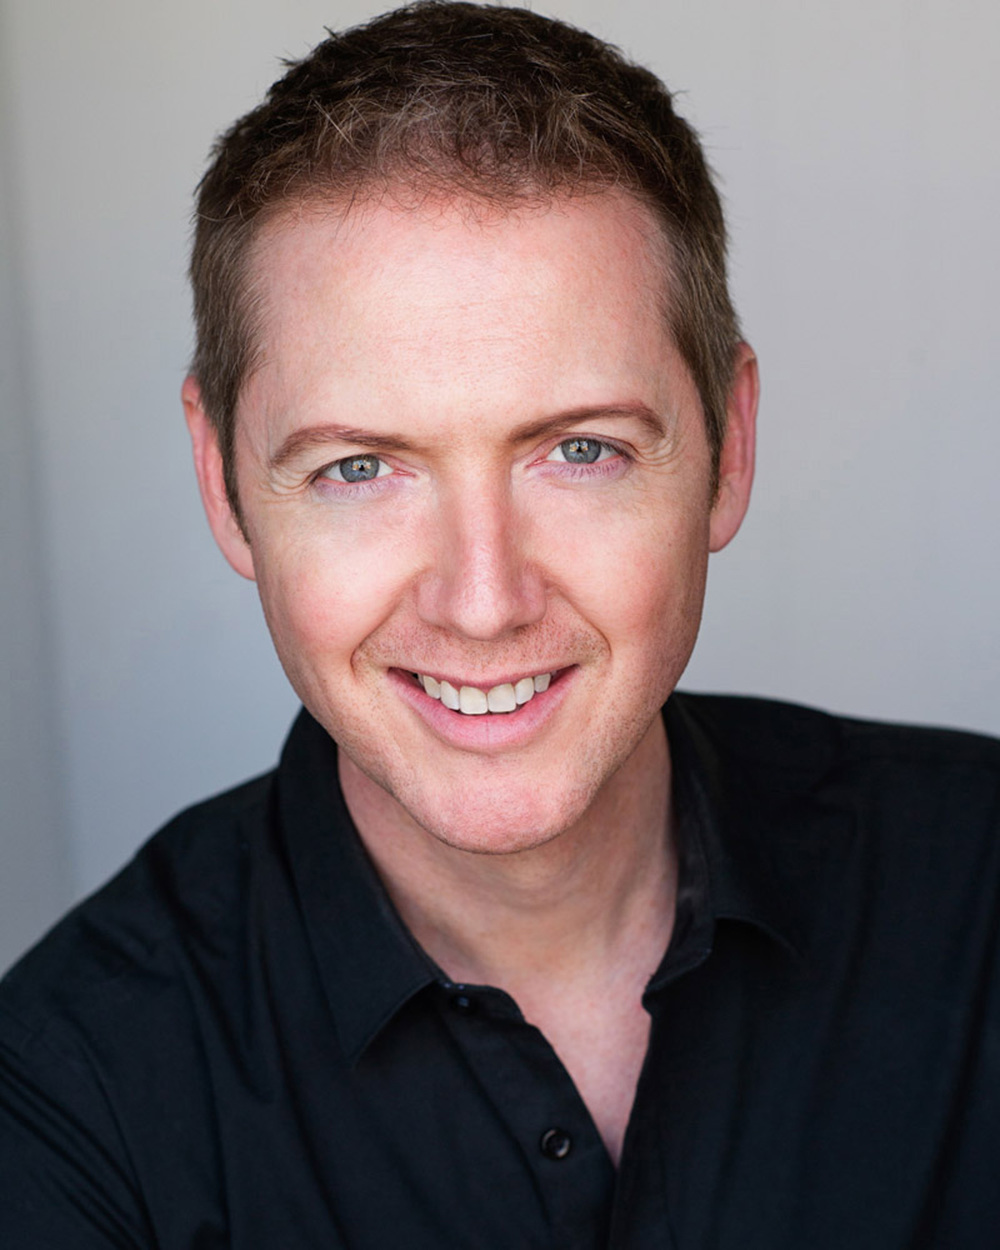 Jason Langley